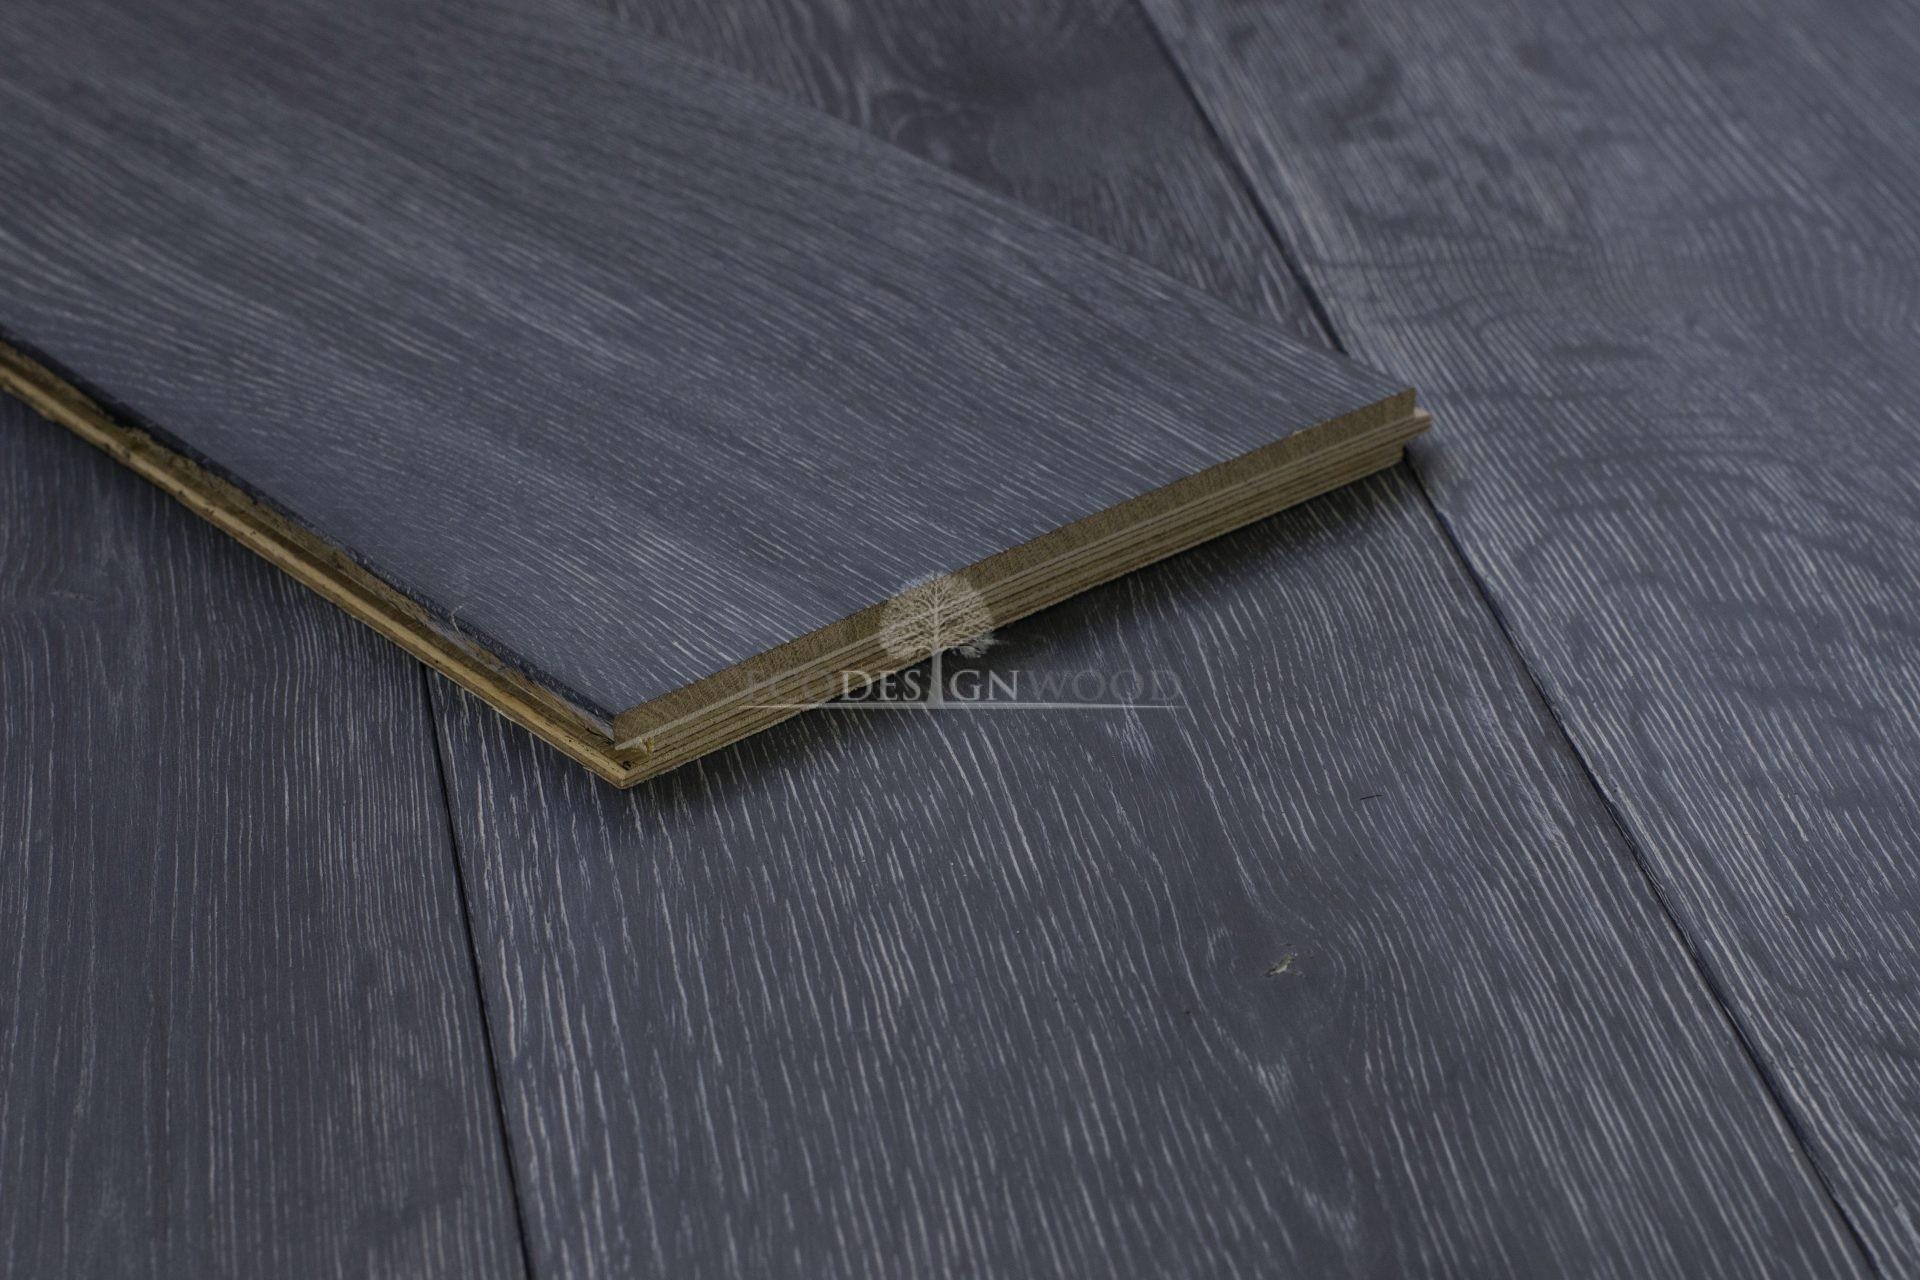 How To Make Charred Wood Siding Blog Eco Design Wood